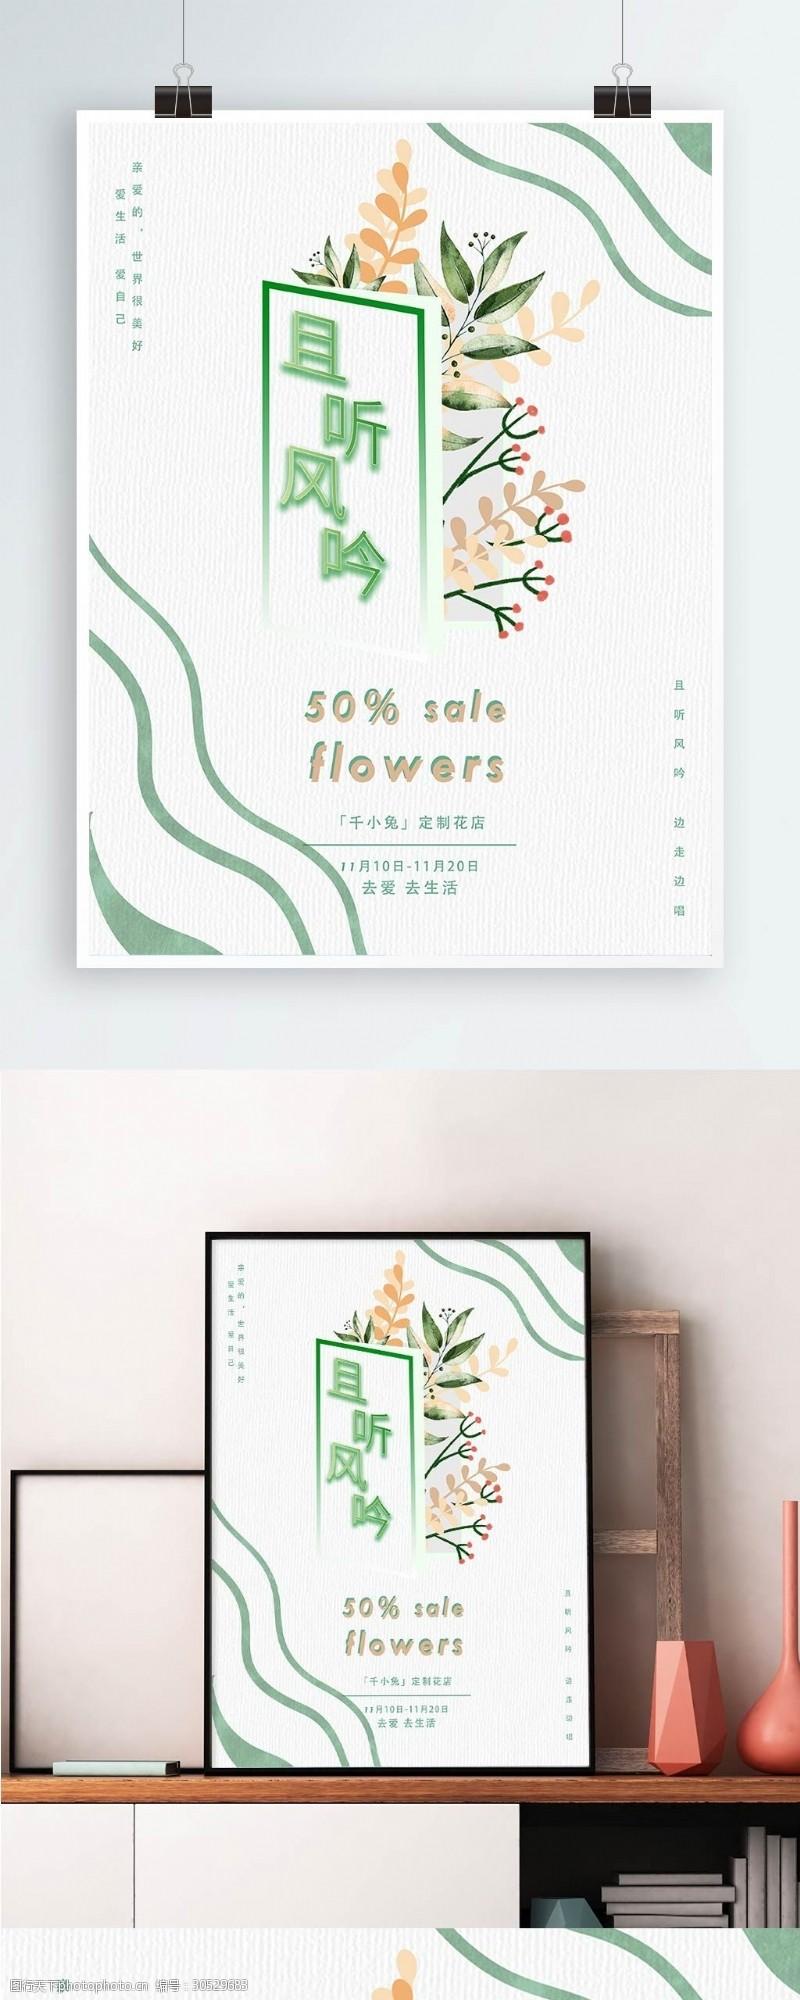 flowers且听风吟小清新文艺简约花店促销宣传海报